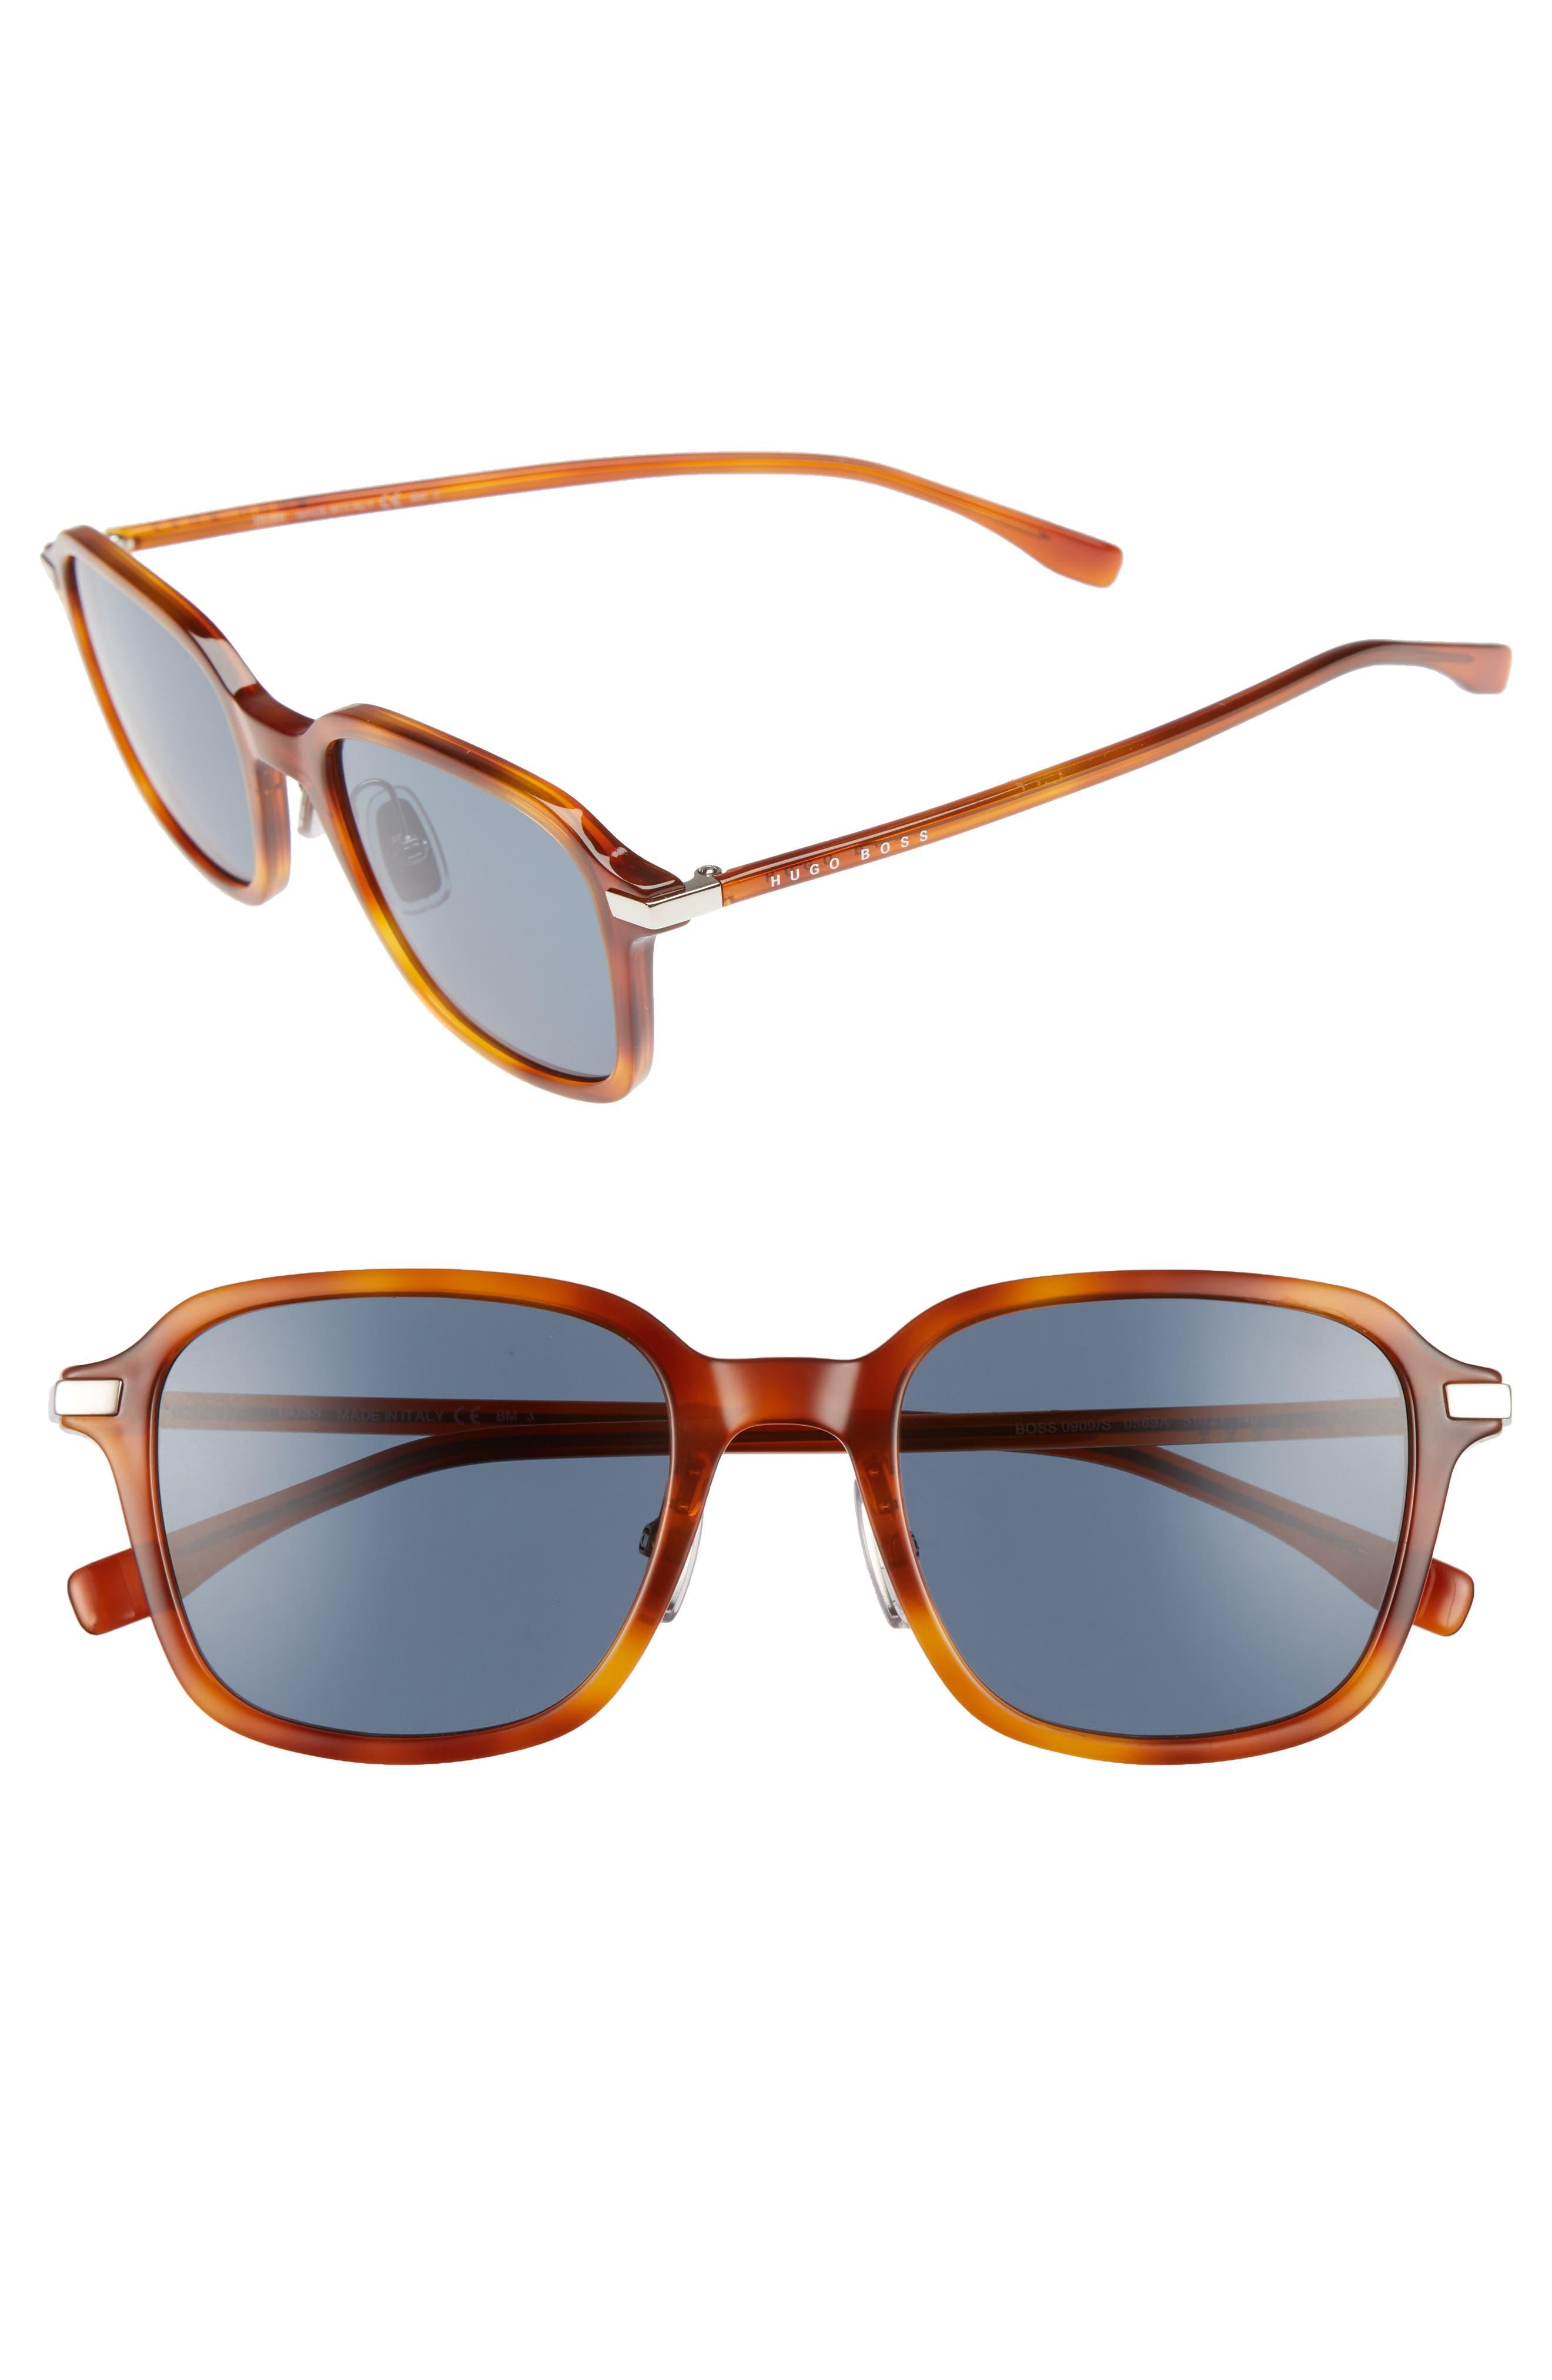 0909S 51mm Sunglasses,                         Main,                         color, 210